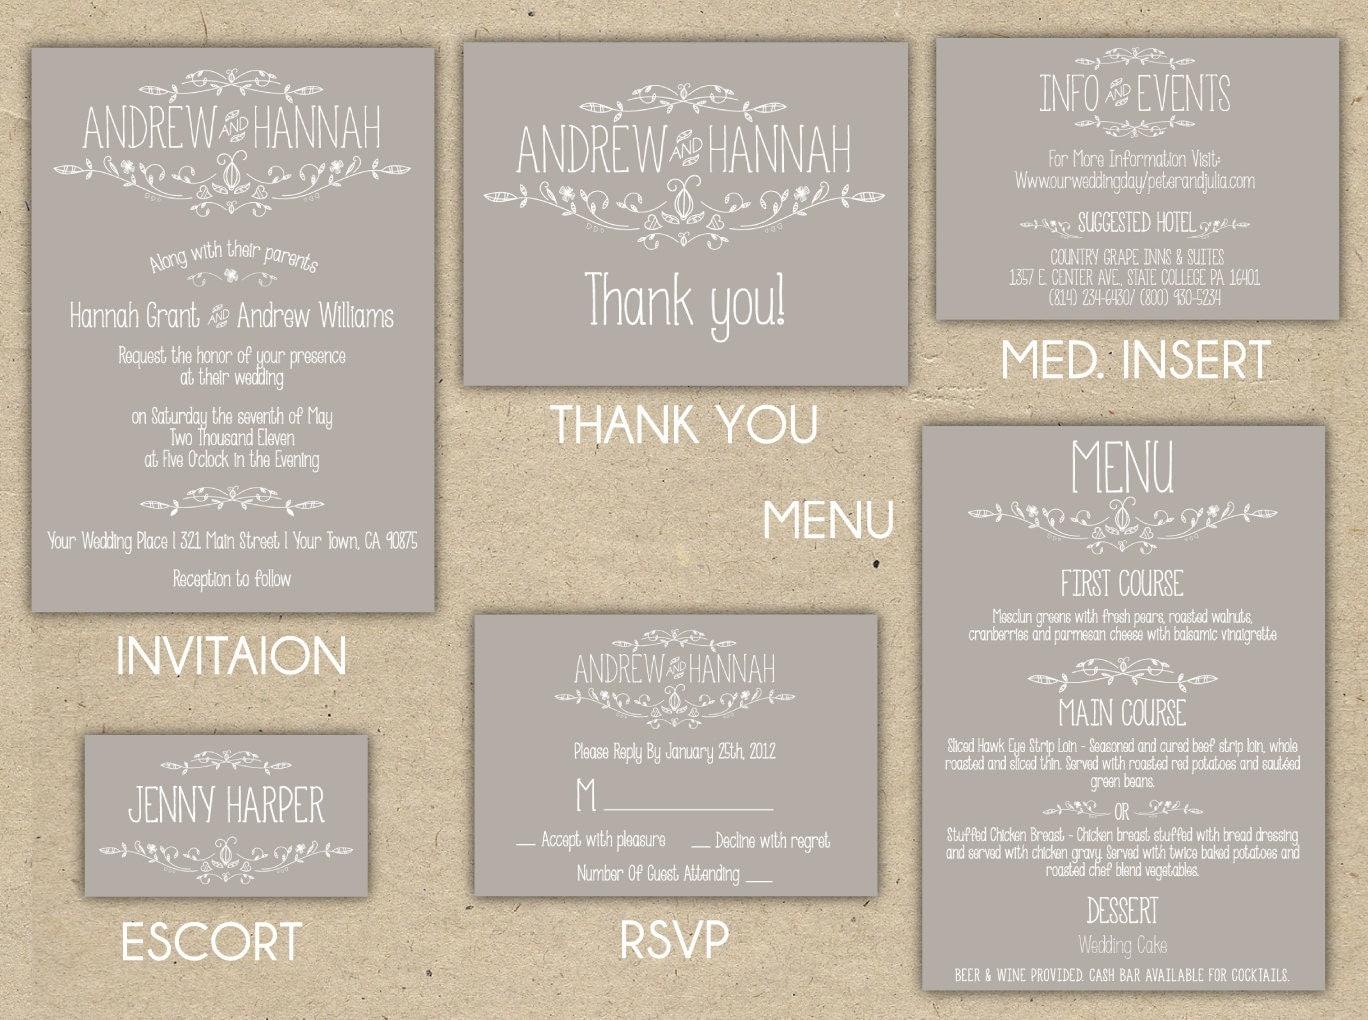 Wedding Invitations Diy Templates Free: Vintage Wedding Invitation Collection Printable DIY. Printed